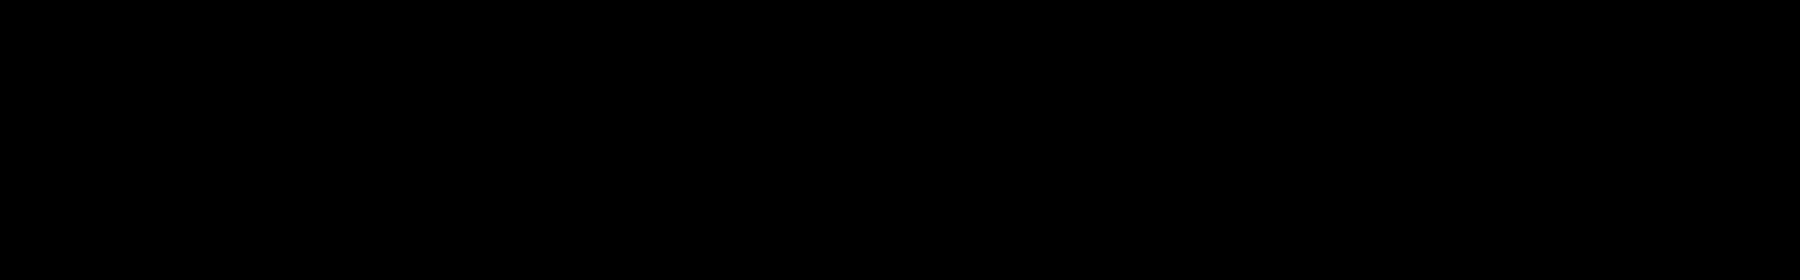 Tech House Beats 17 feat Phil Kieran audio waveform